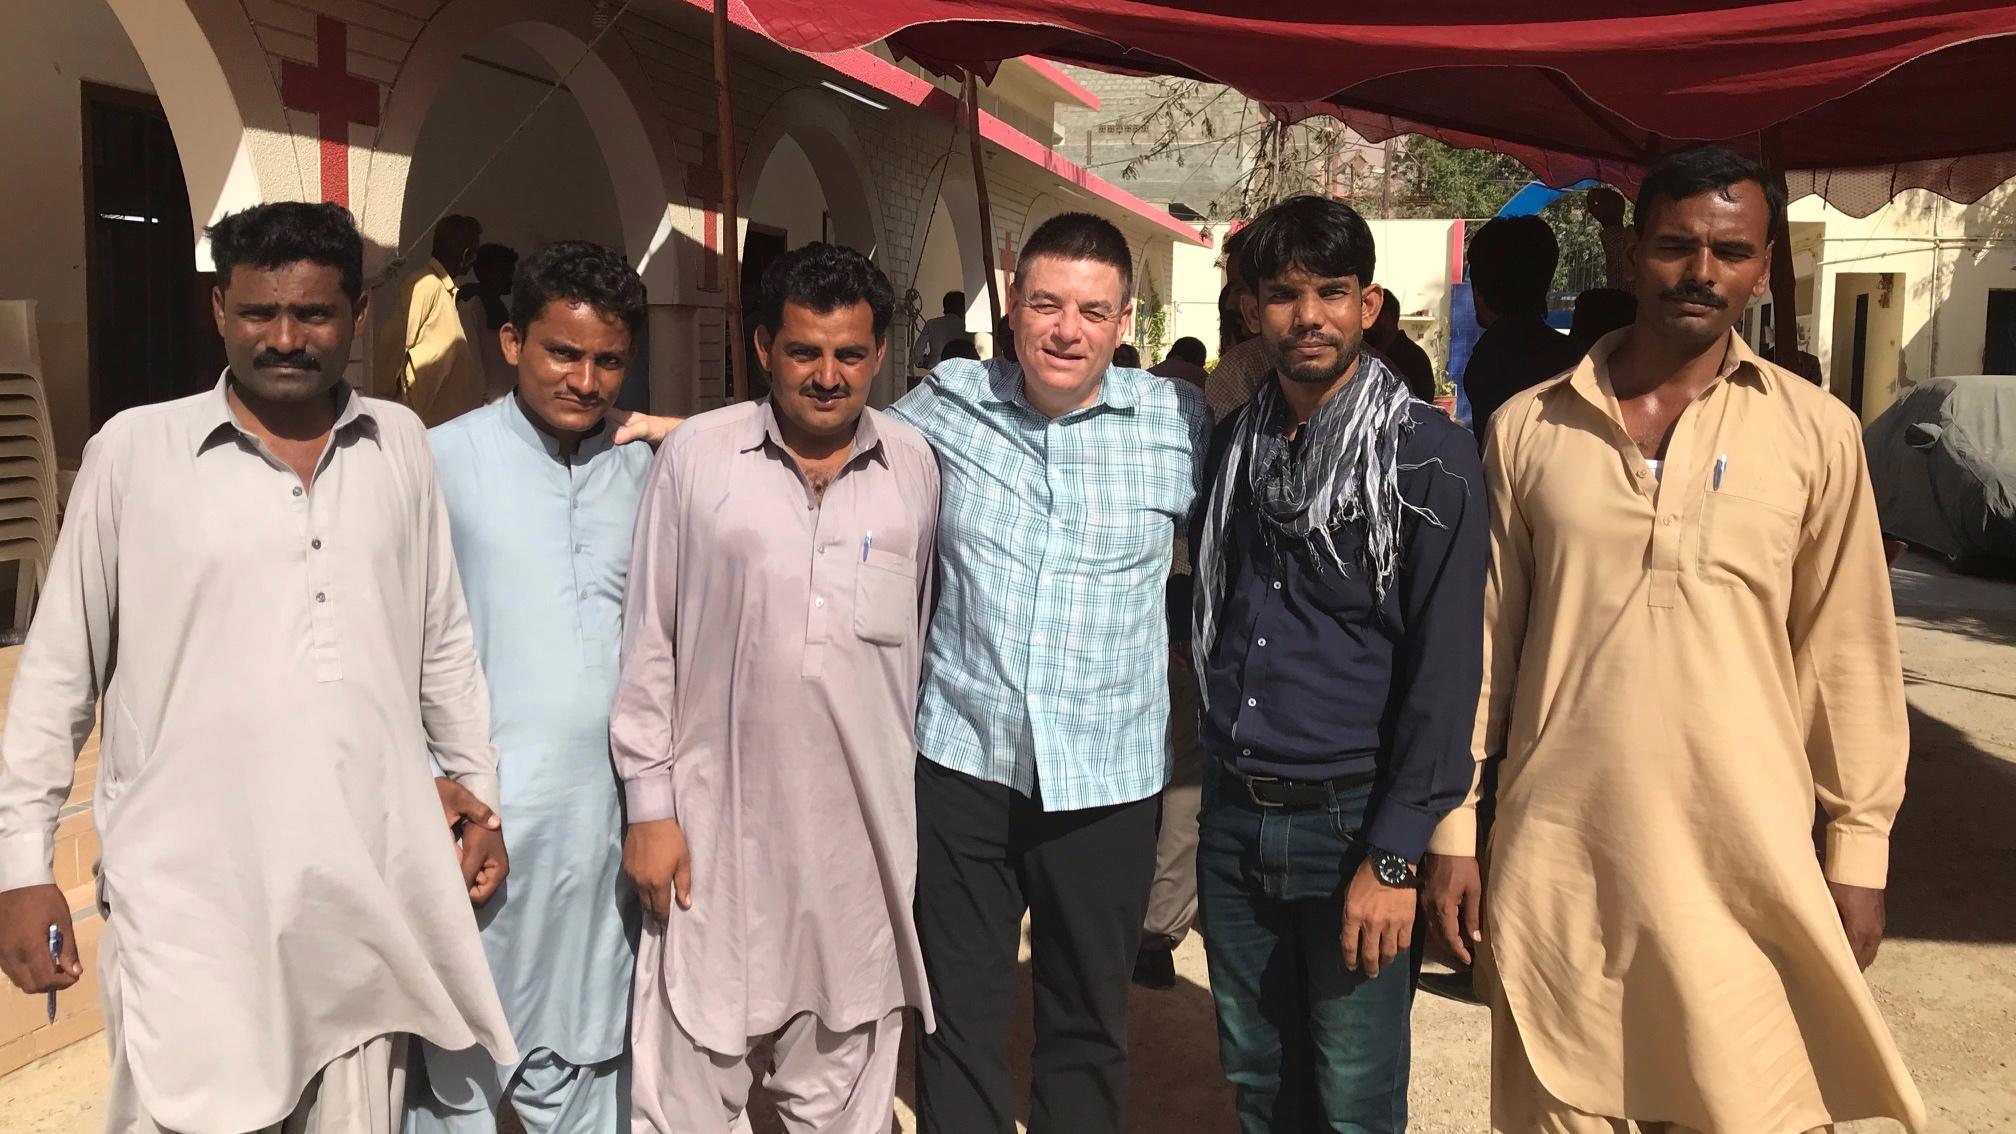 Pakistan+Village+Pastors.jpg